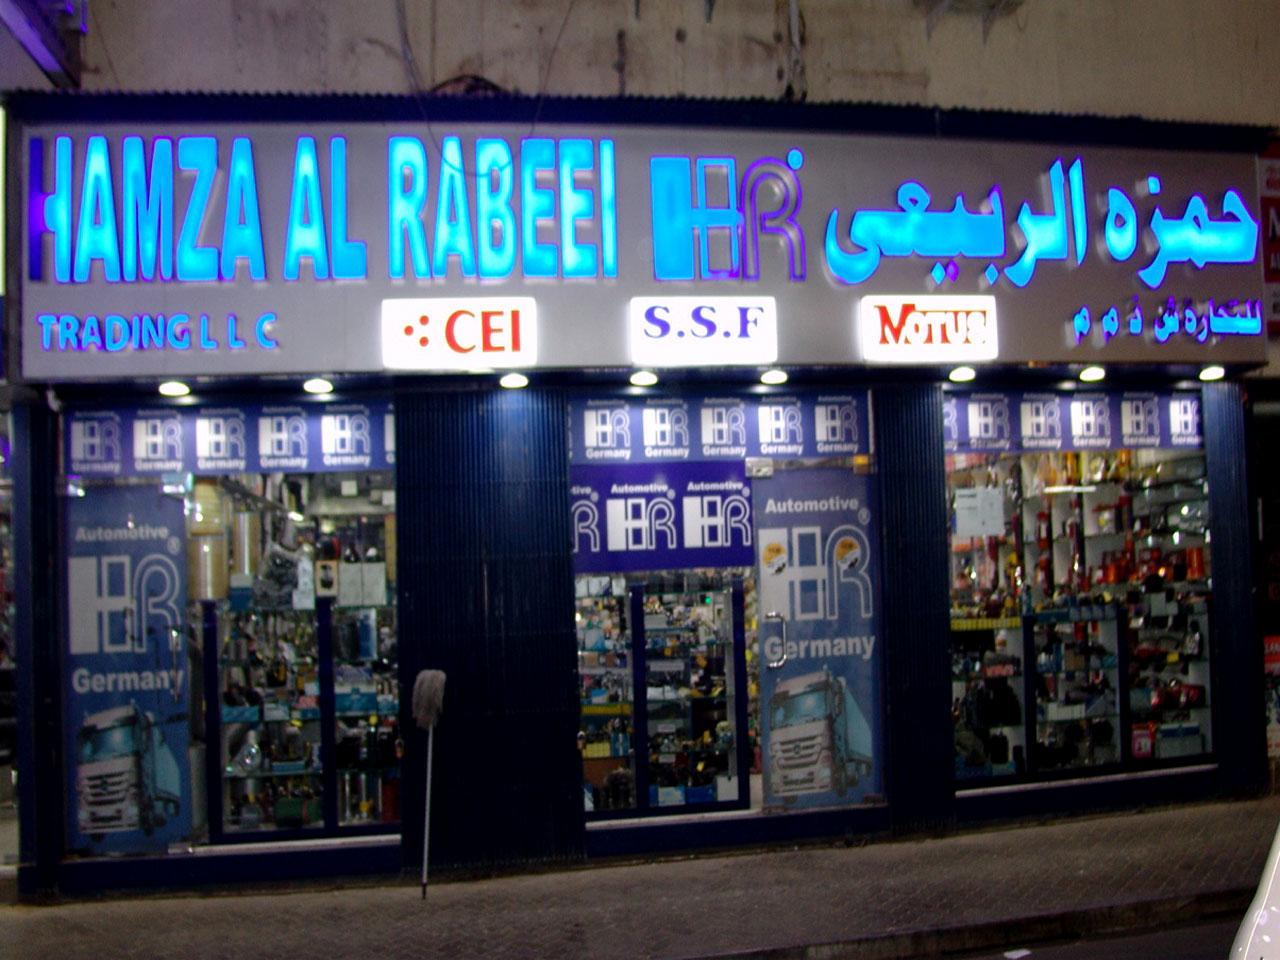 Hamza Al Rabeei Trading LLC - 1.jpg